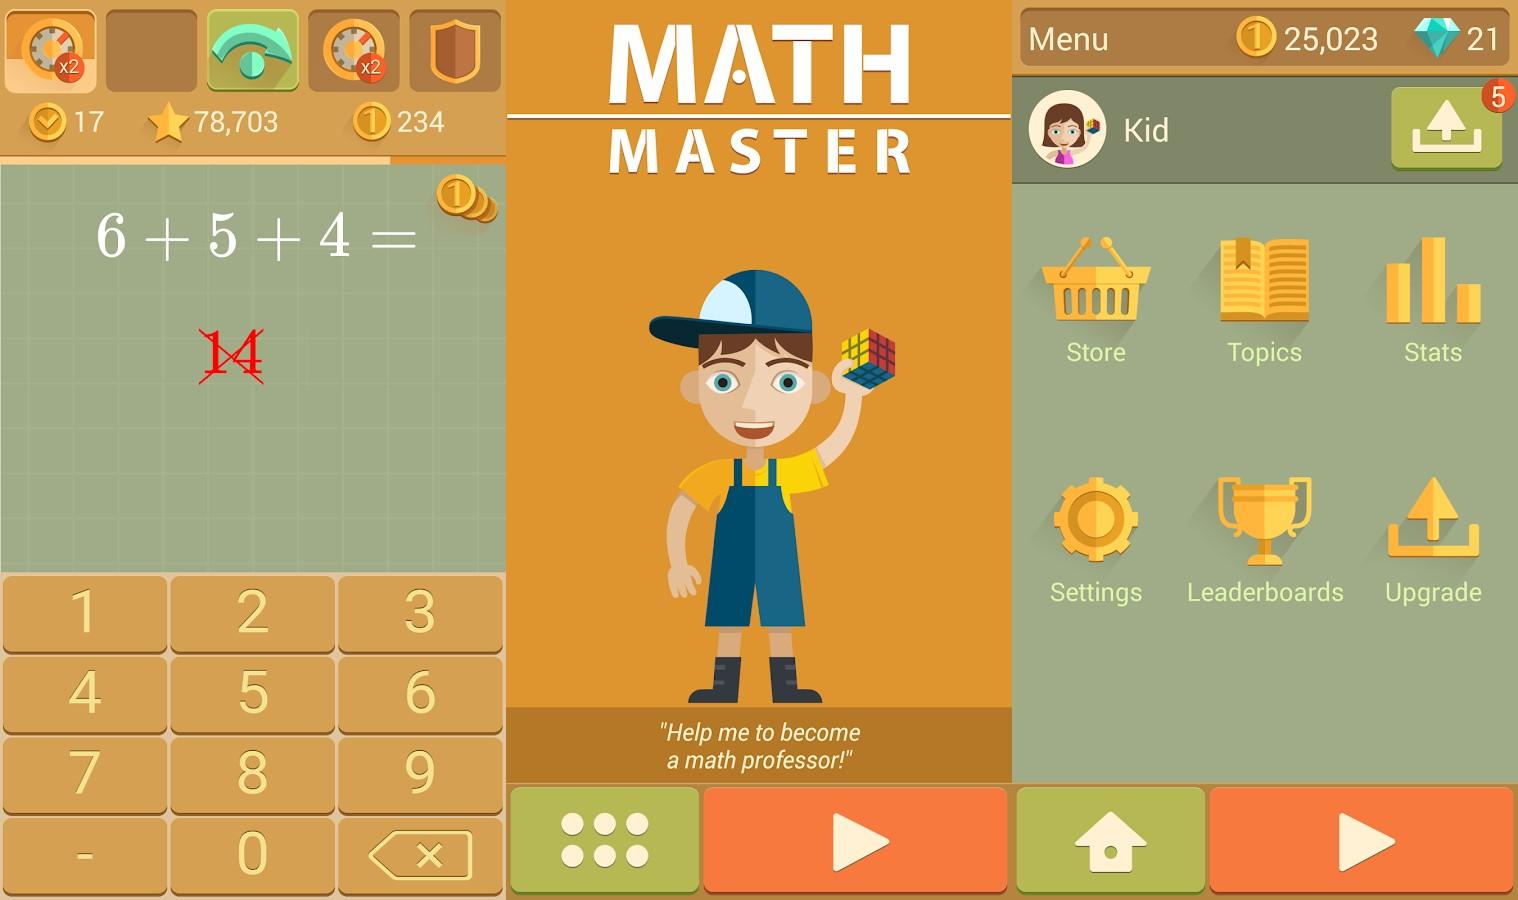 Math-Master-teaching-app-and-brain-workout